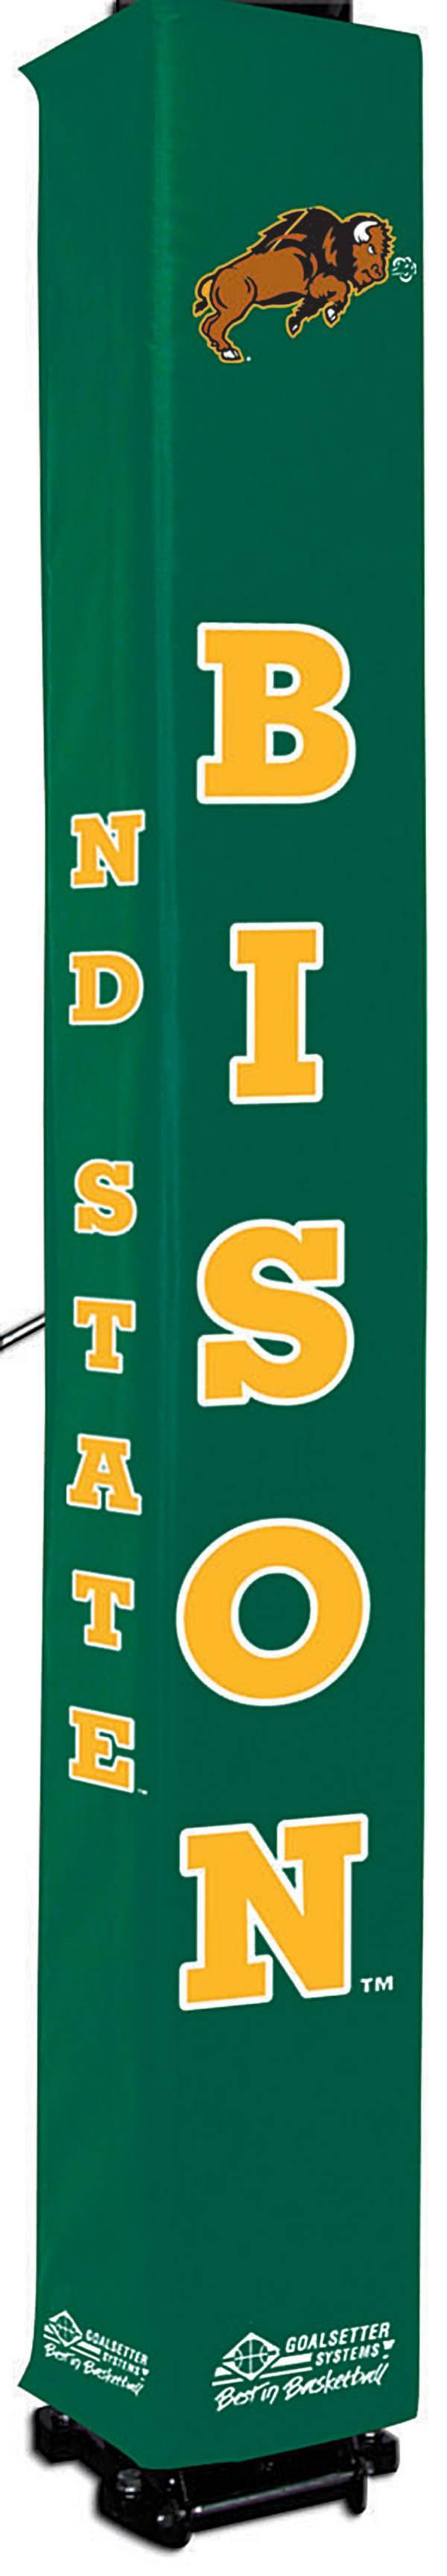 Goalsetter North Dakota State Bison Basketball Pole Pad product image